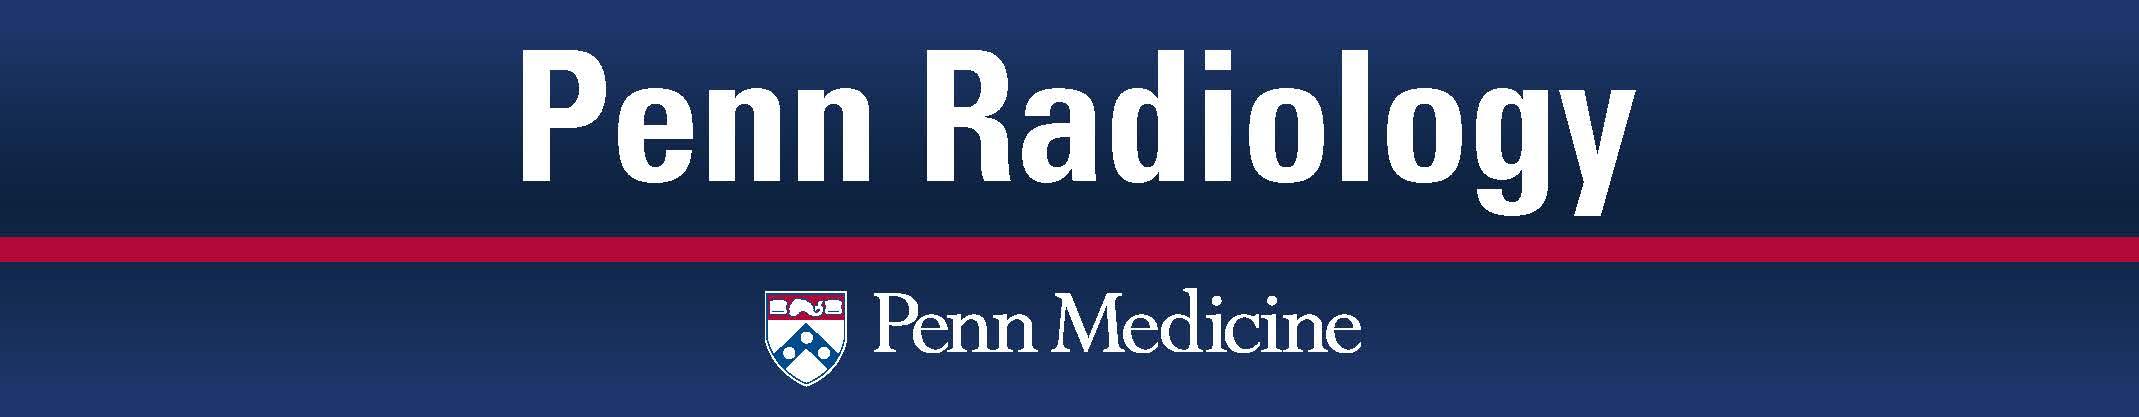 Penn Radiology Banner - 770x150-b